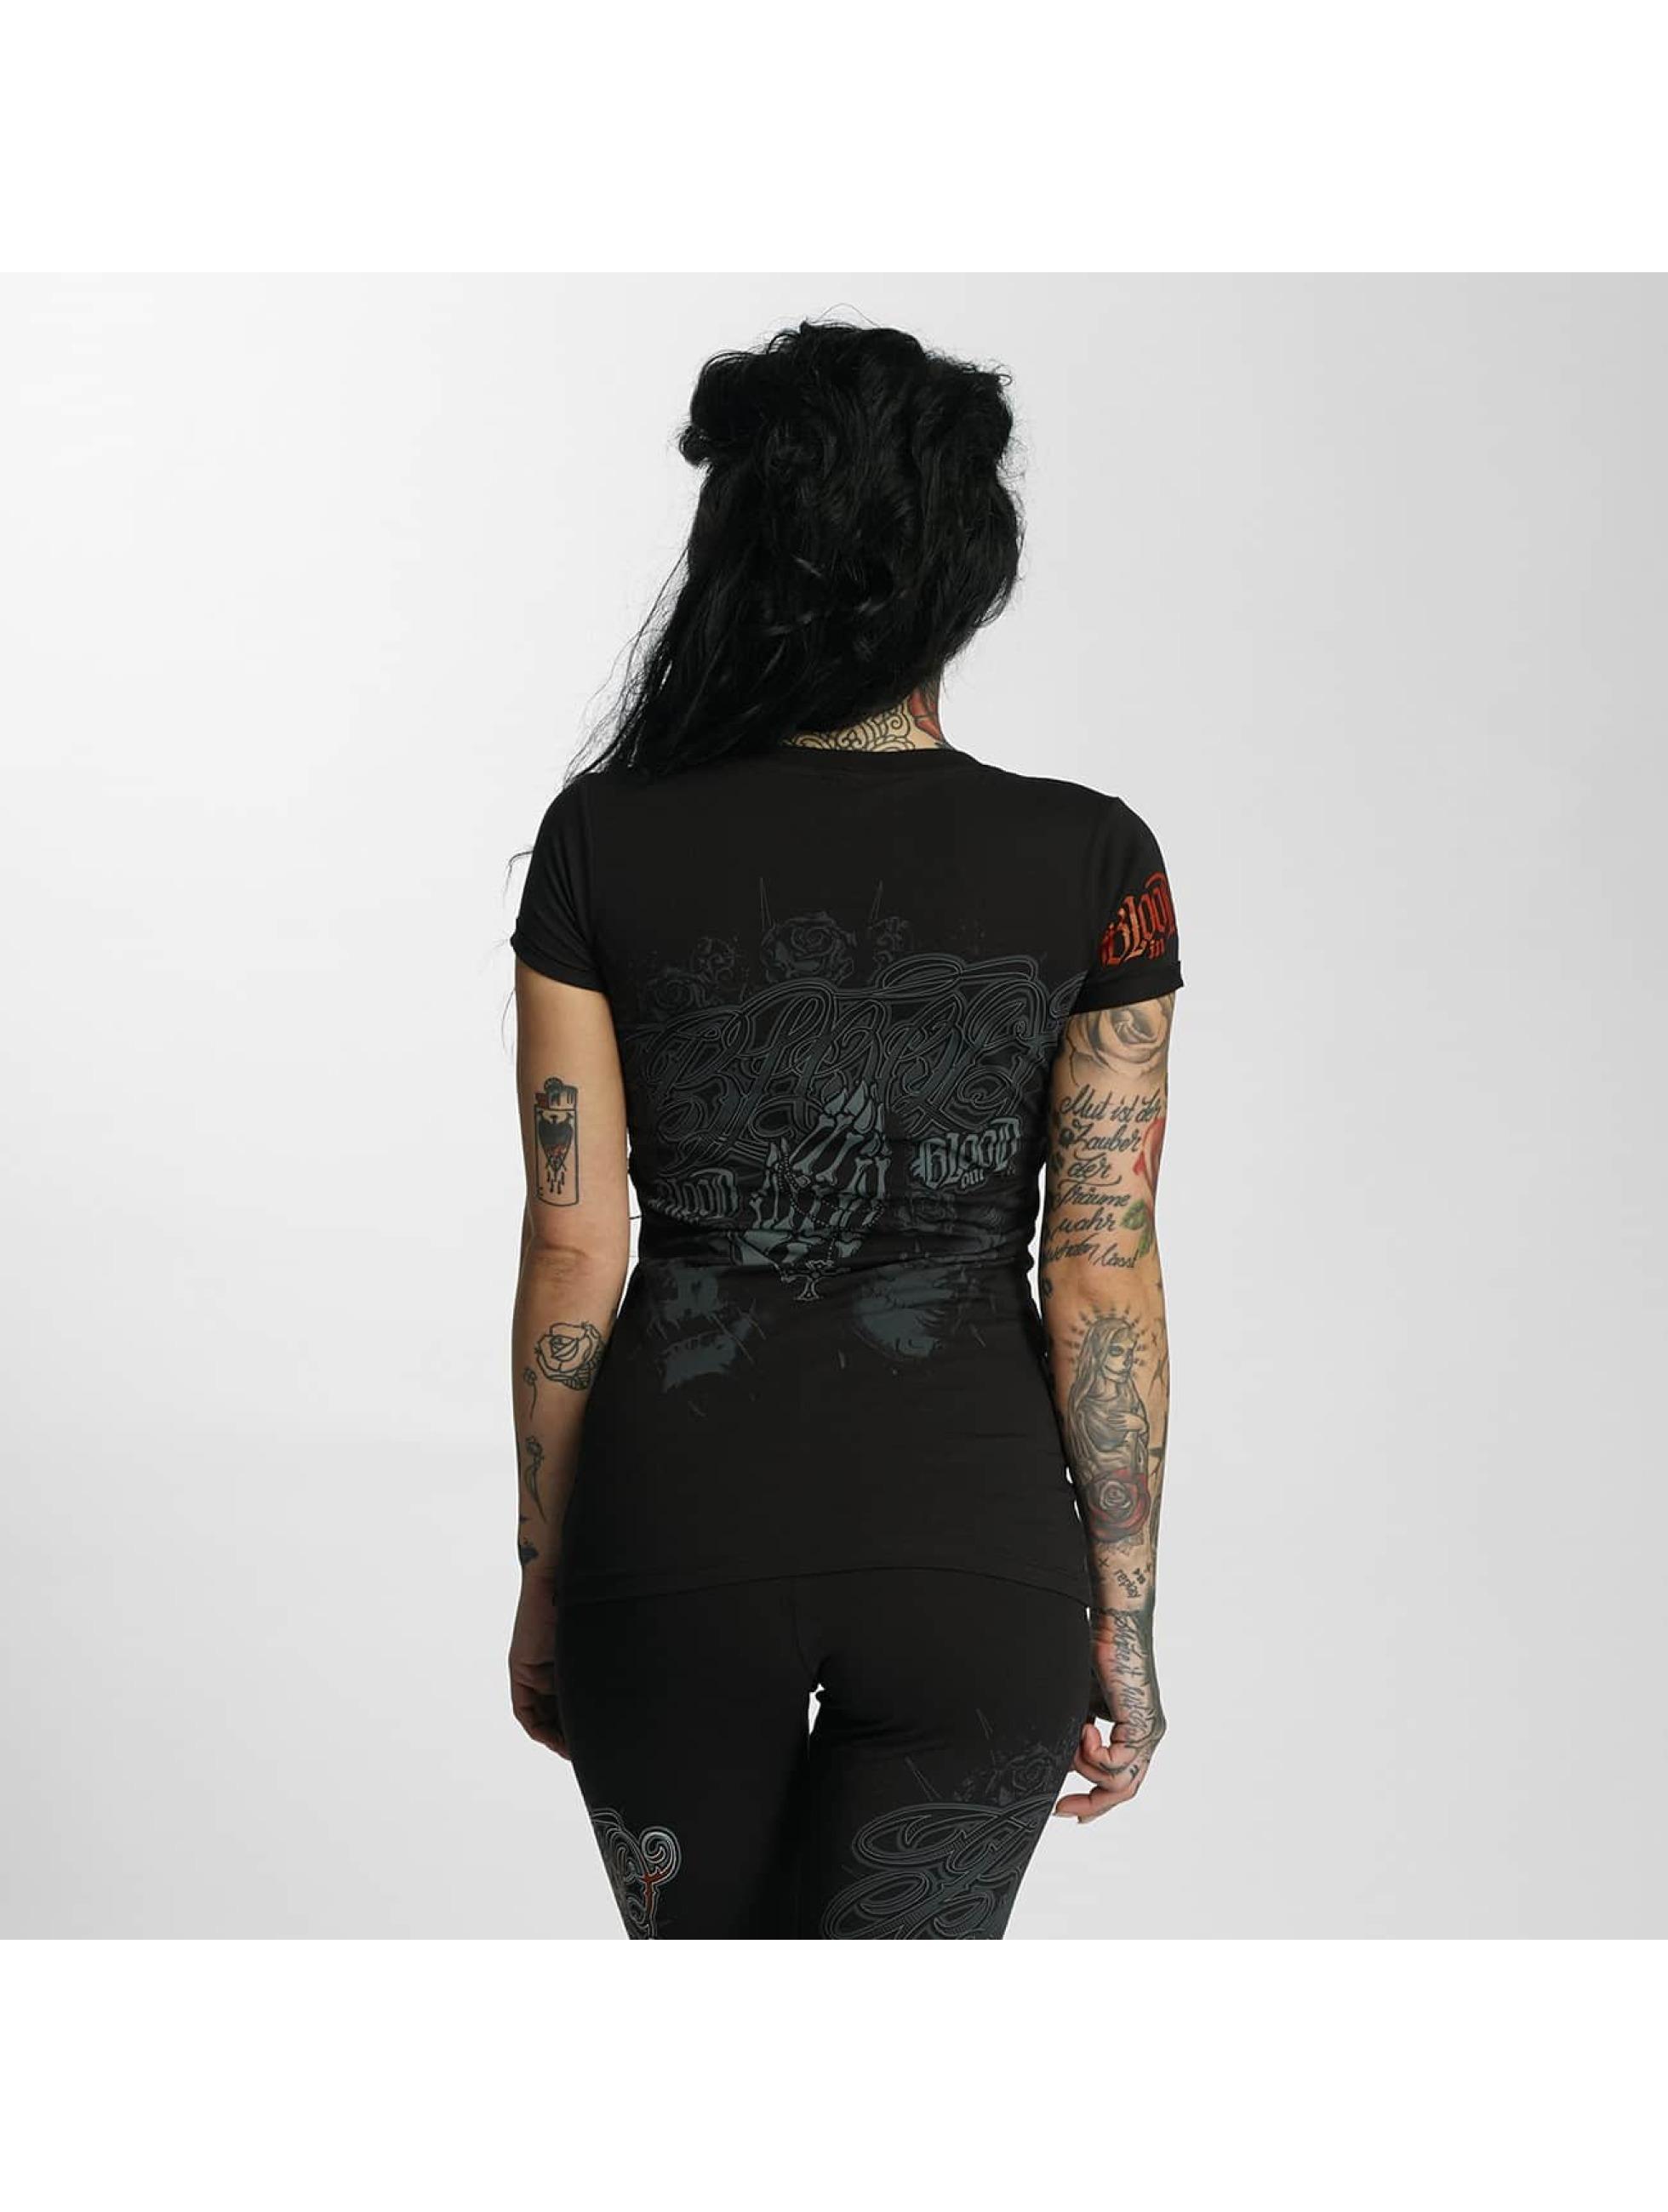 Blood In Blood Out Camiseta Manos Orando negro